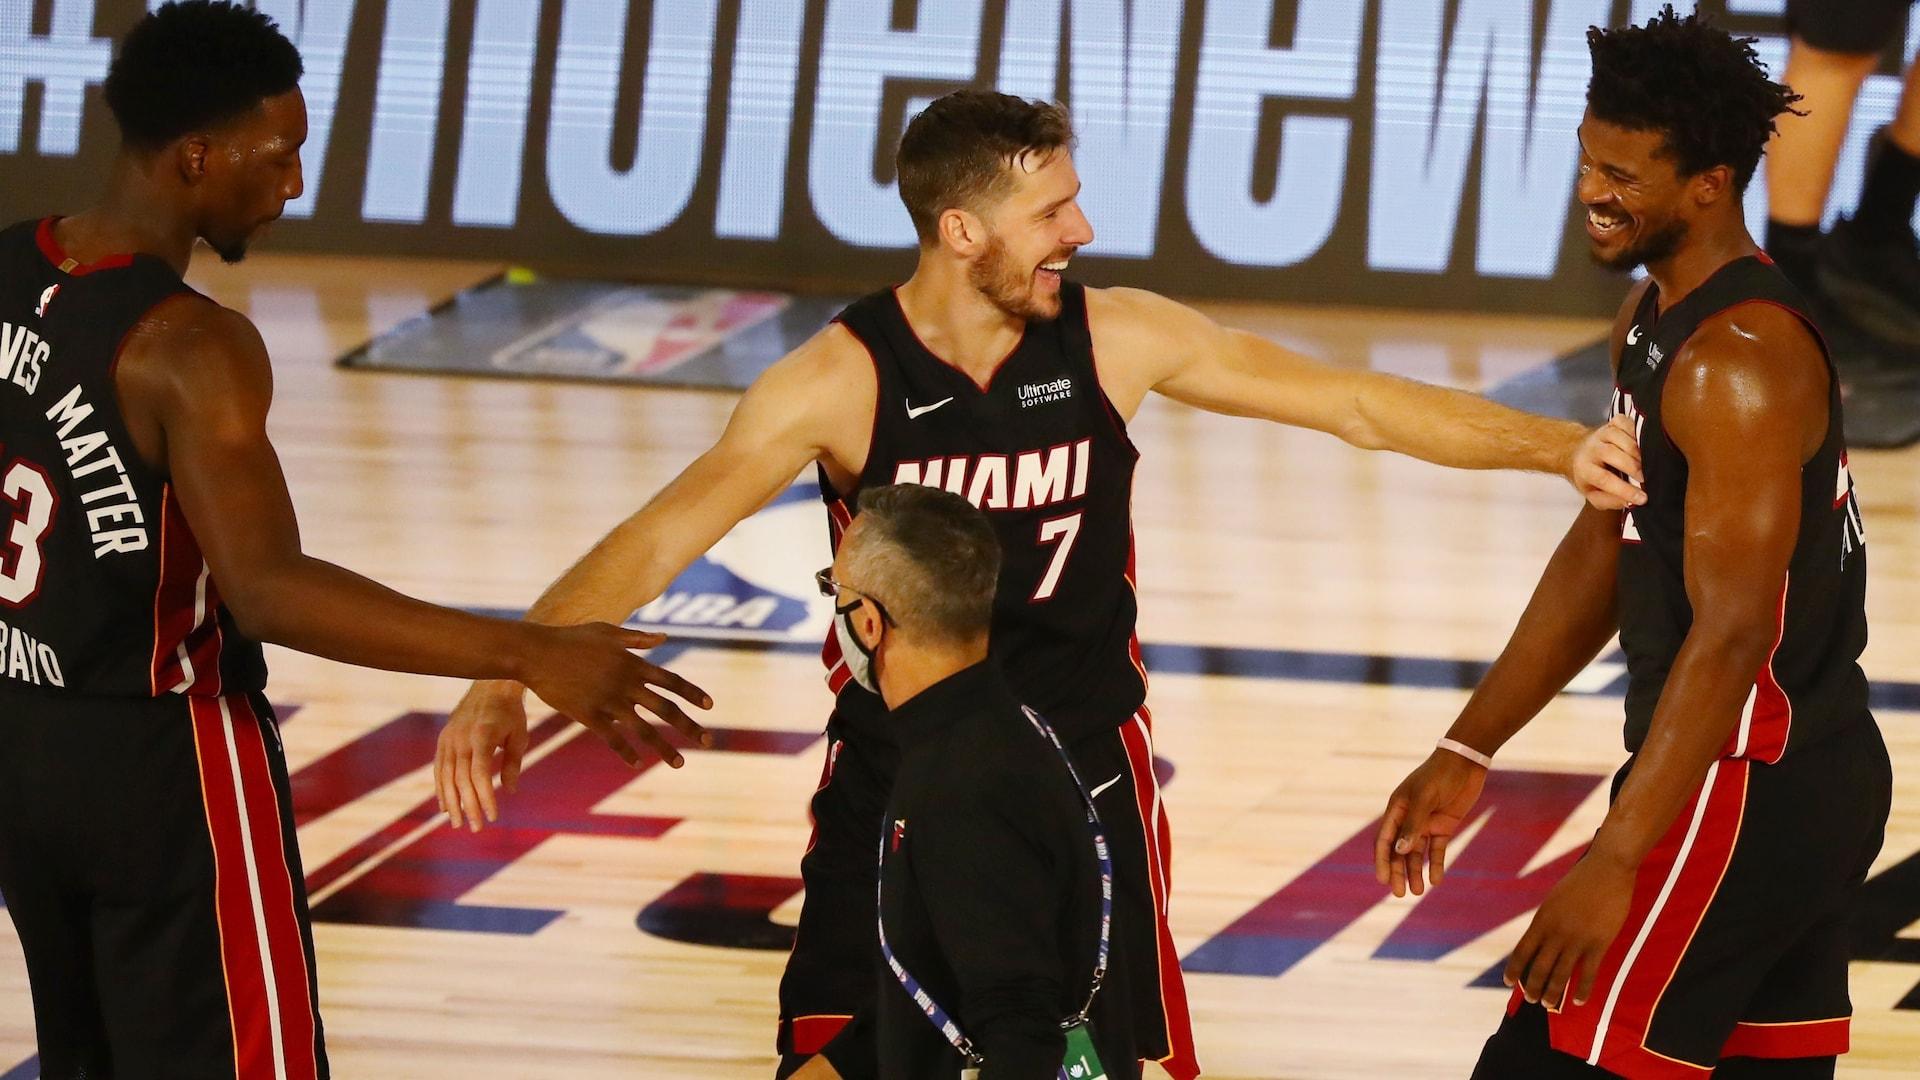 4 factors that could help Heat upset Lakers